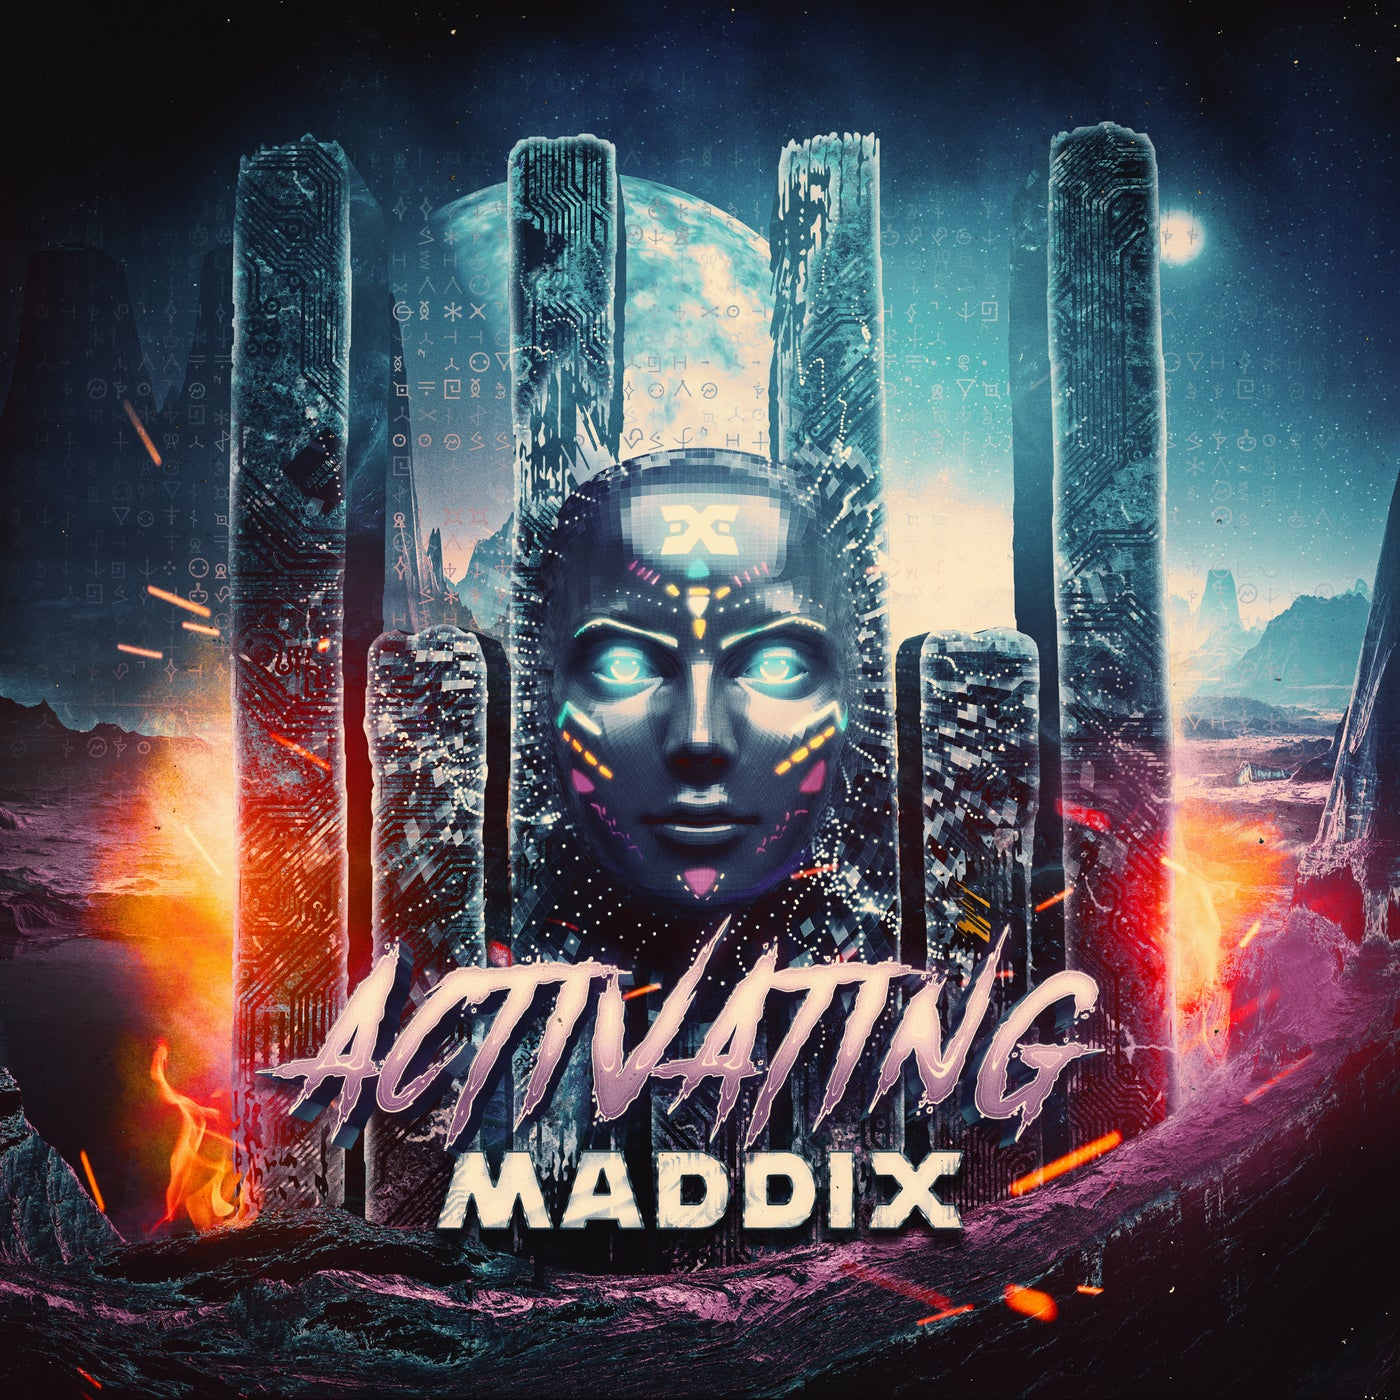 Activating (Original Mix)